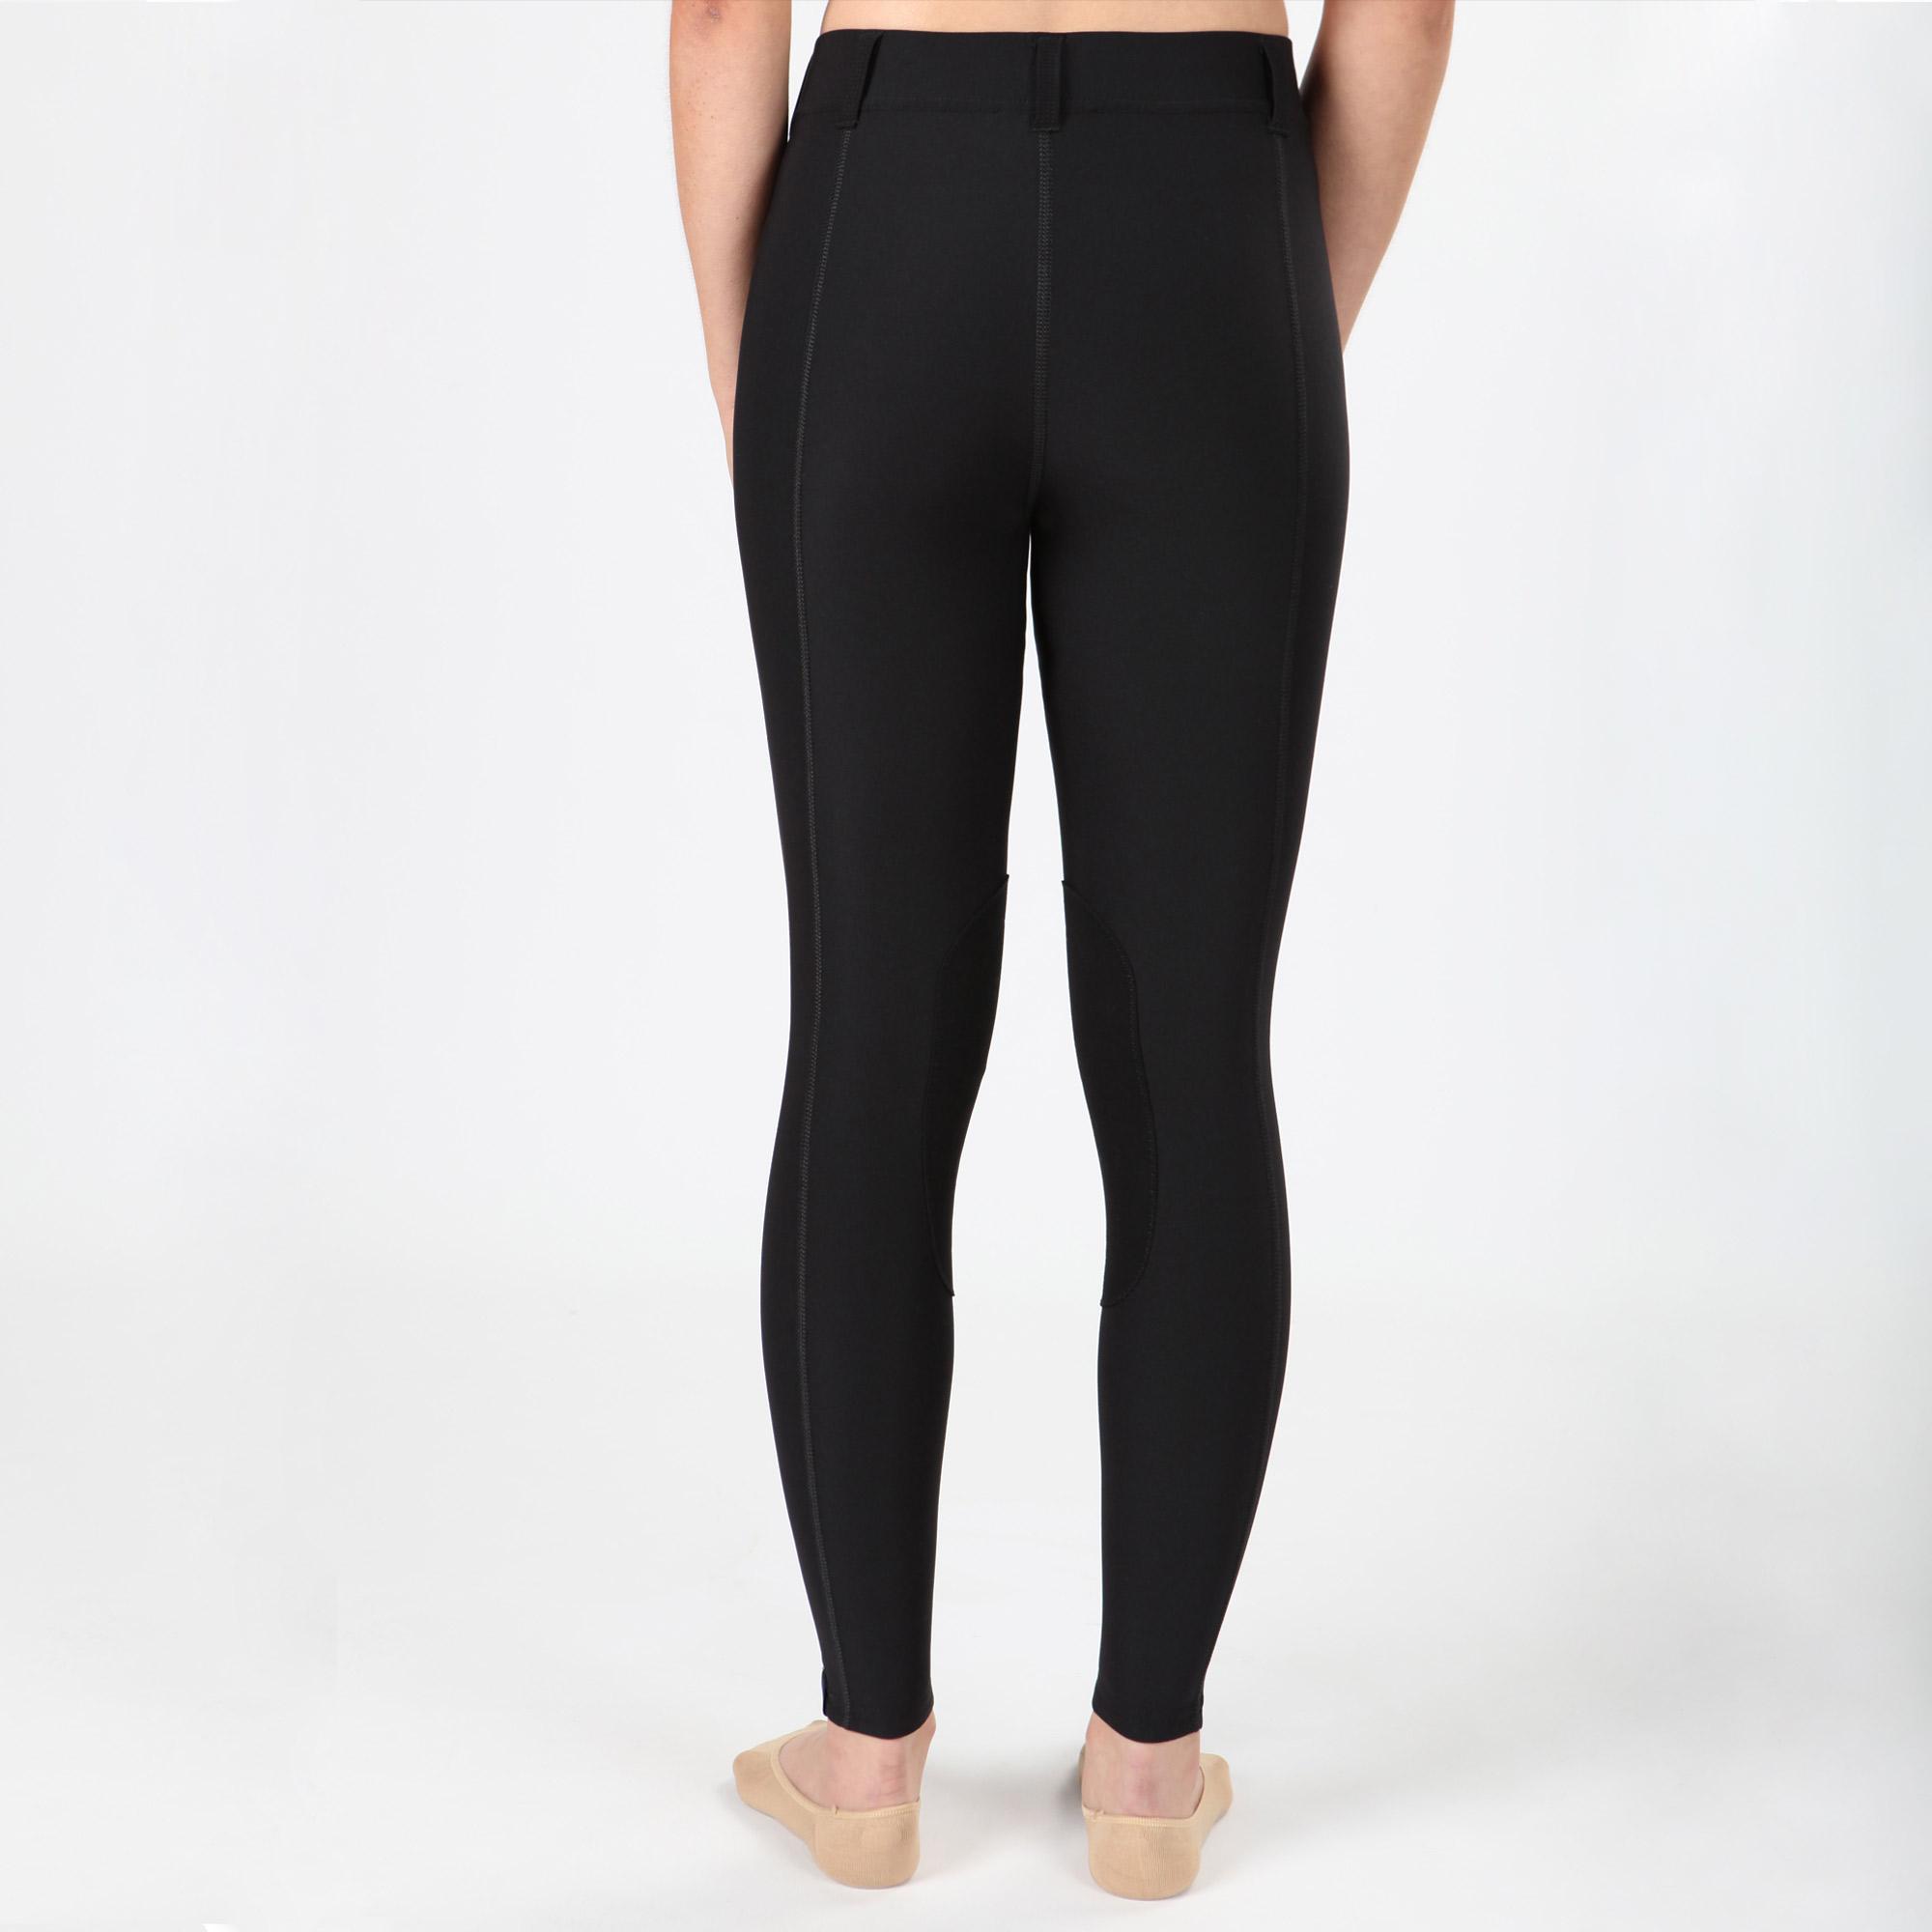 TheLovely - Womens 19 Seamless One Size Nylon Spandex